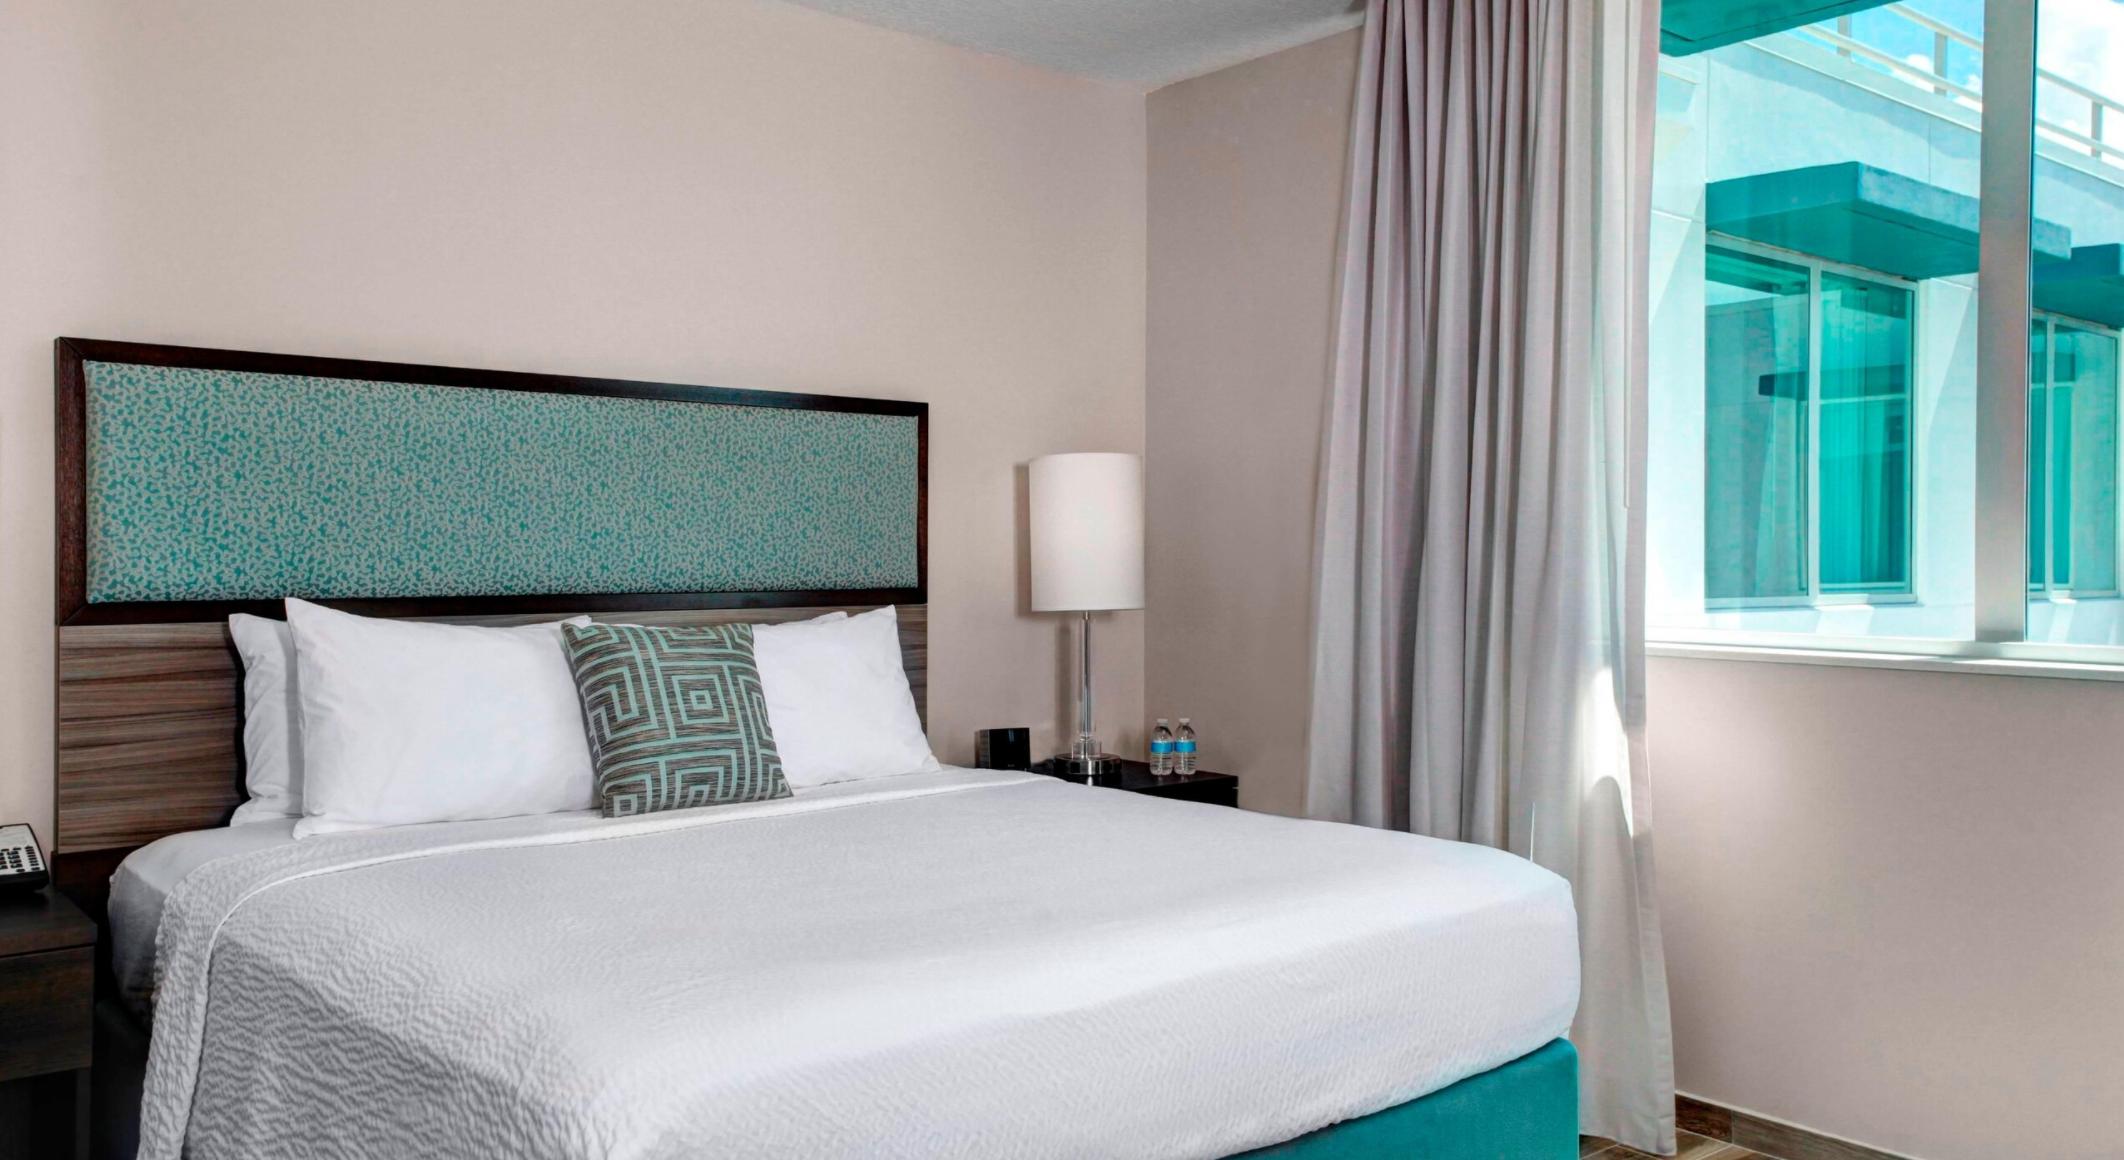 https://www.hotelsbyday.com/_data/default-hotel_image/3/17698/screenshot-2020-06-08-at-4-34-31-pm.png